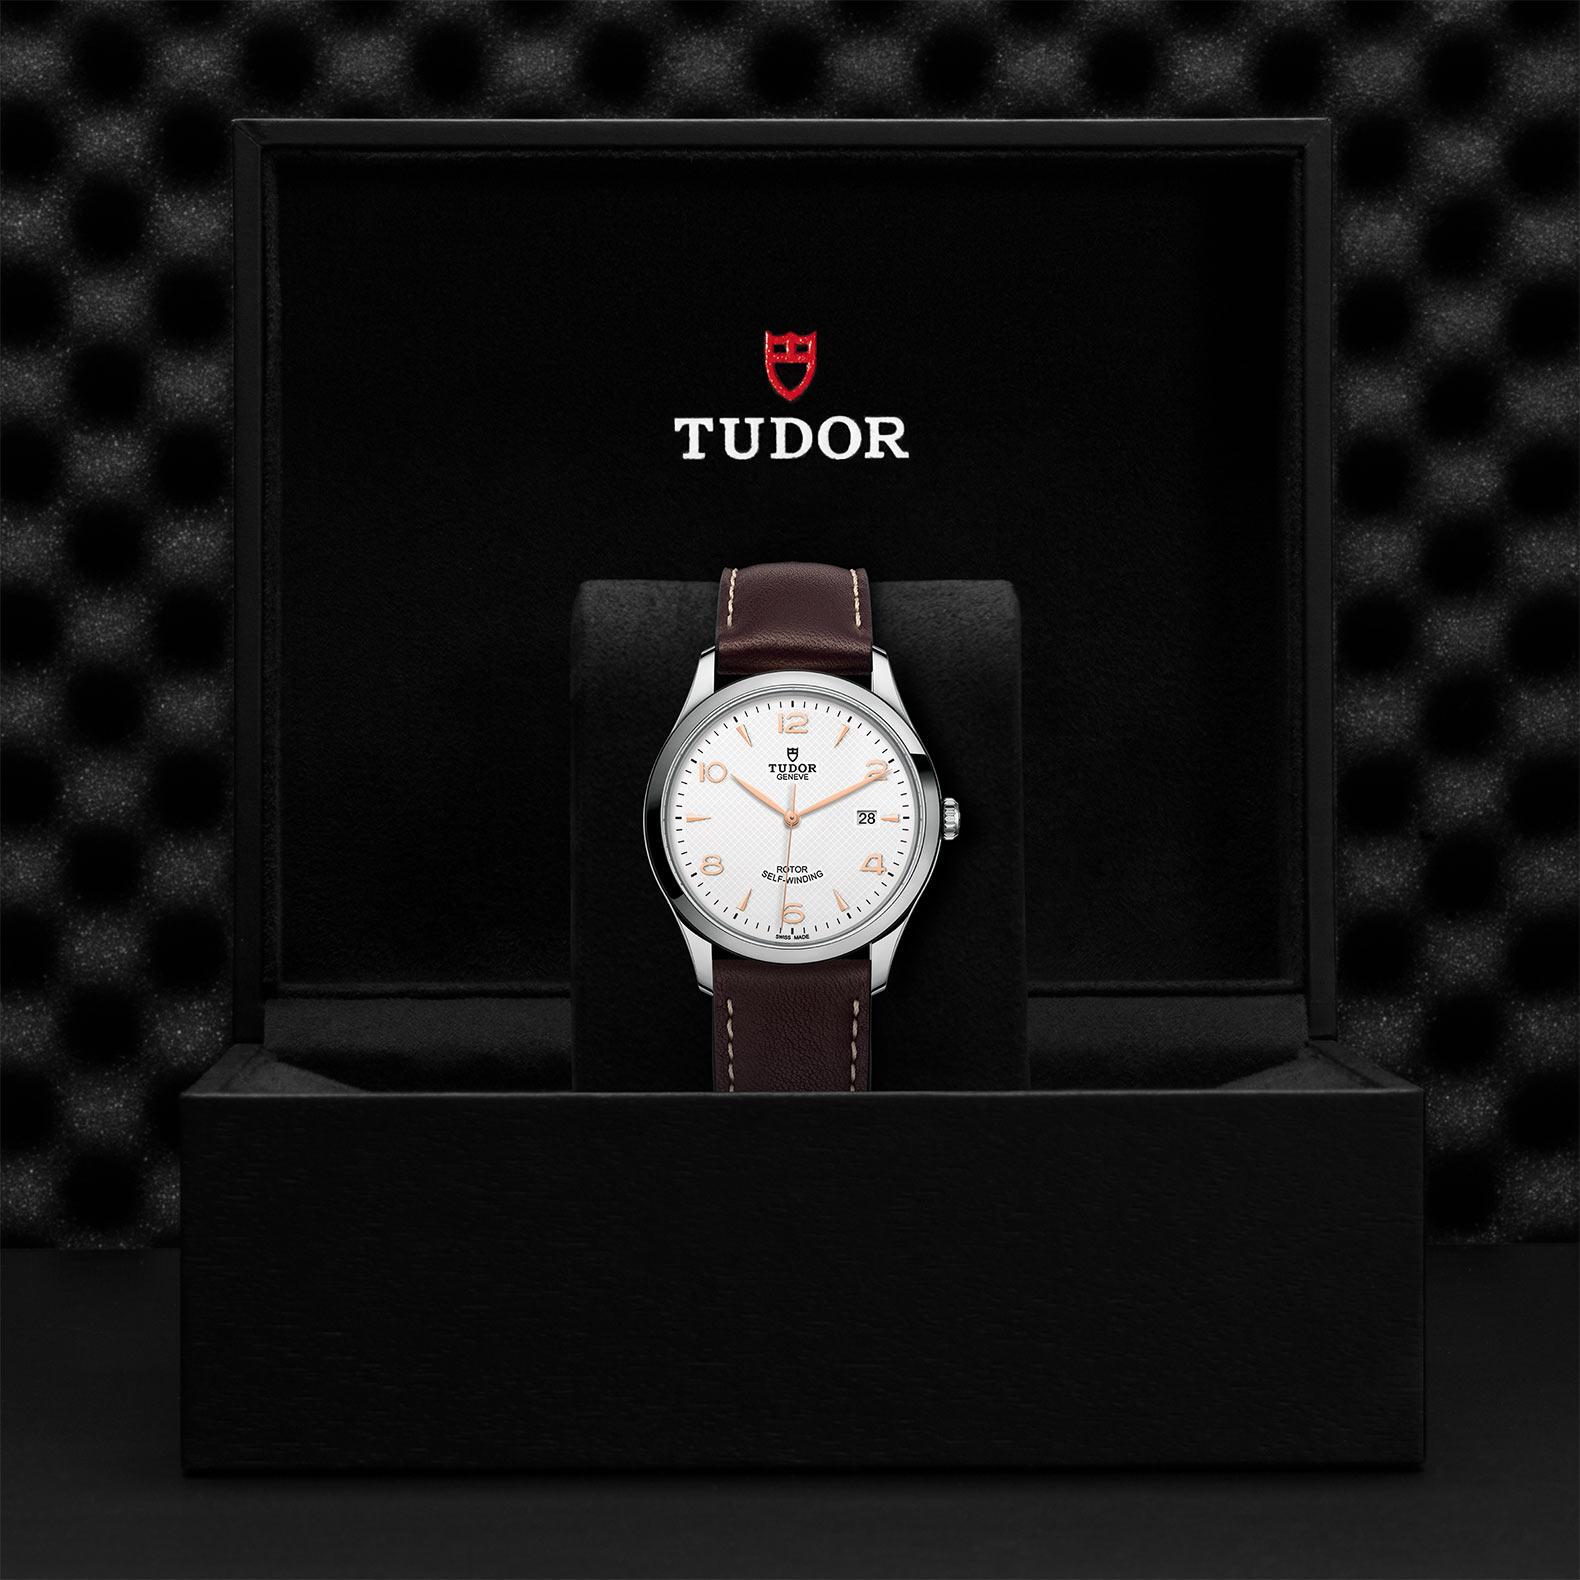 TUDOR 1926 - M91650-0012